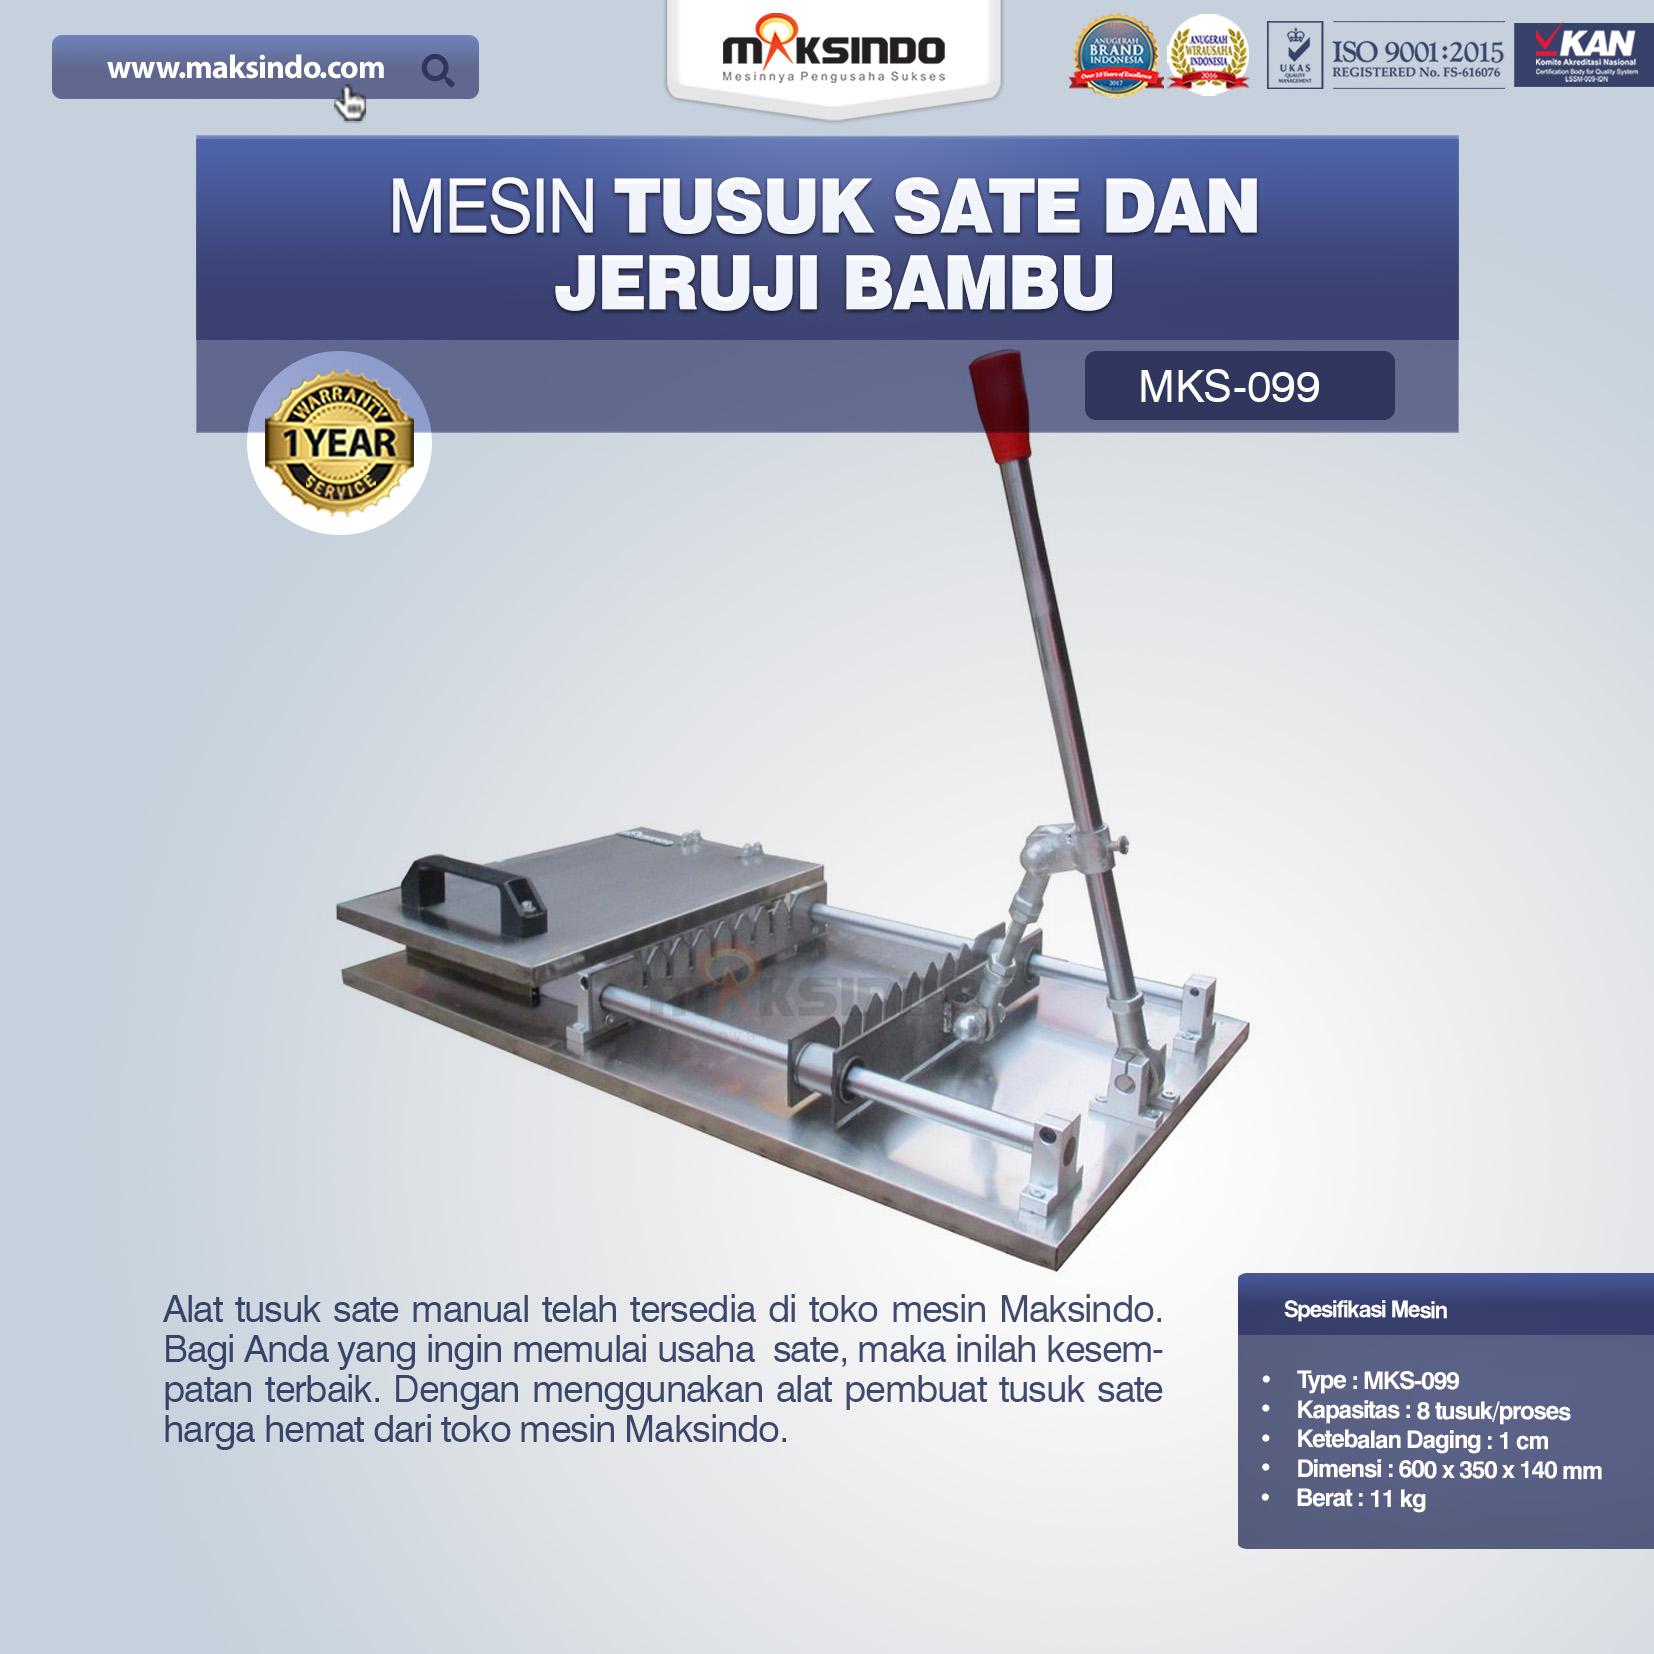 Jual Alat Tusuk Sate Manual MKS-099 di Yogyakarta